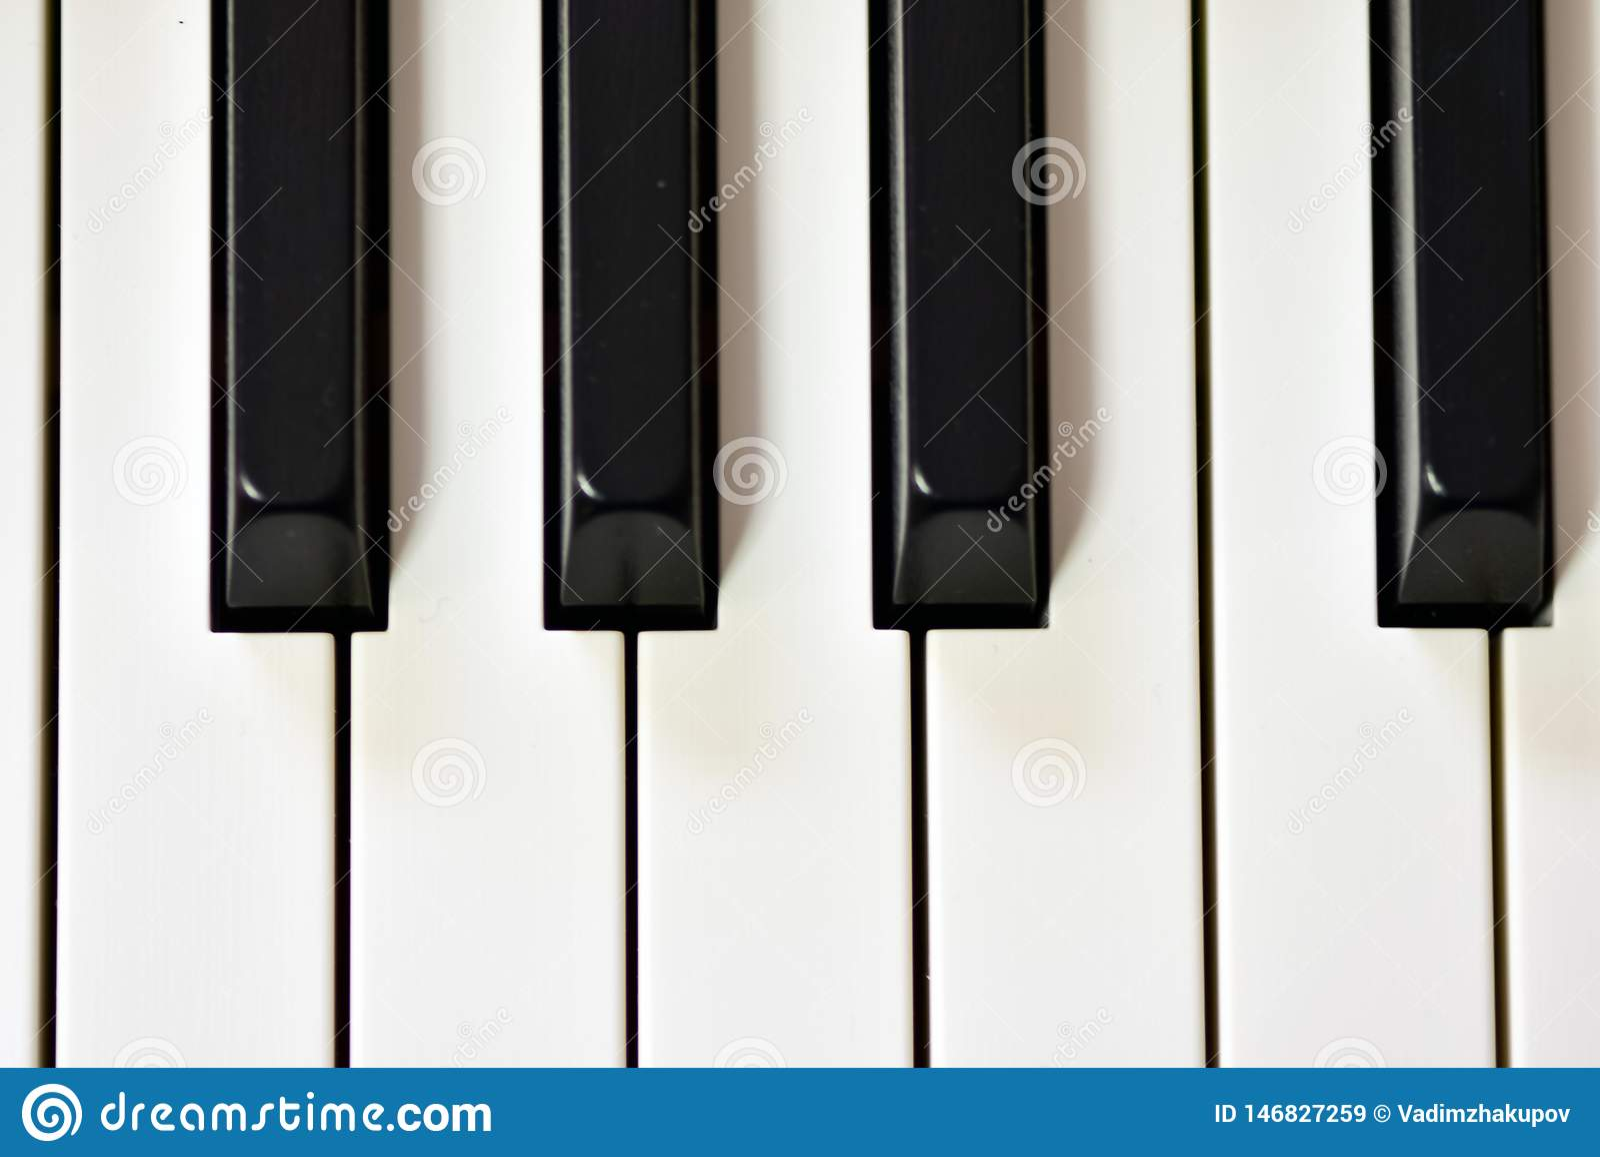 Keys Of A Digital Piano, Soft Focusing, Creative Mood Of A